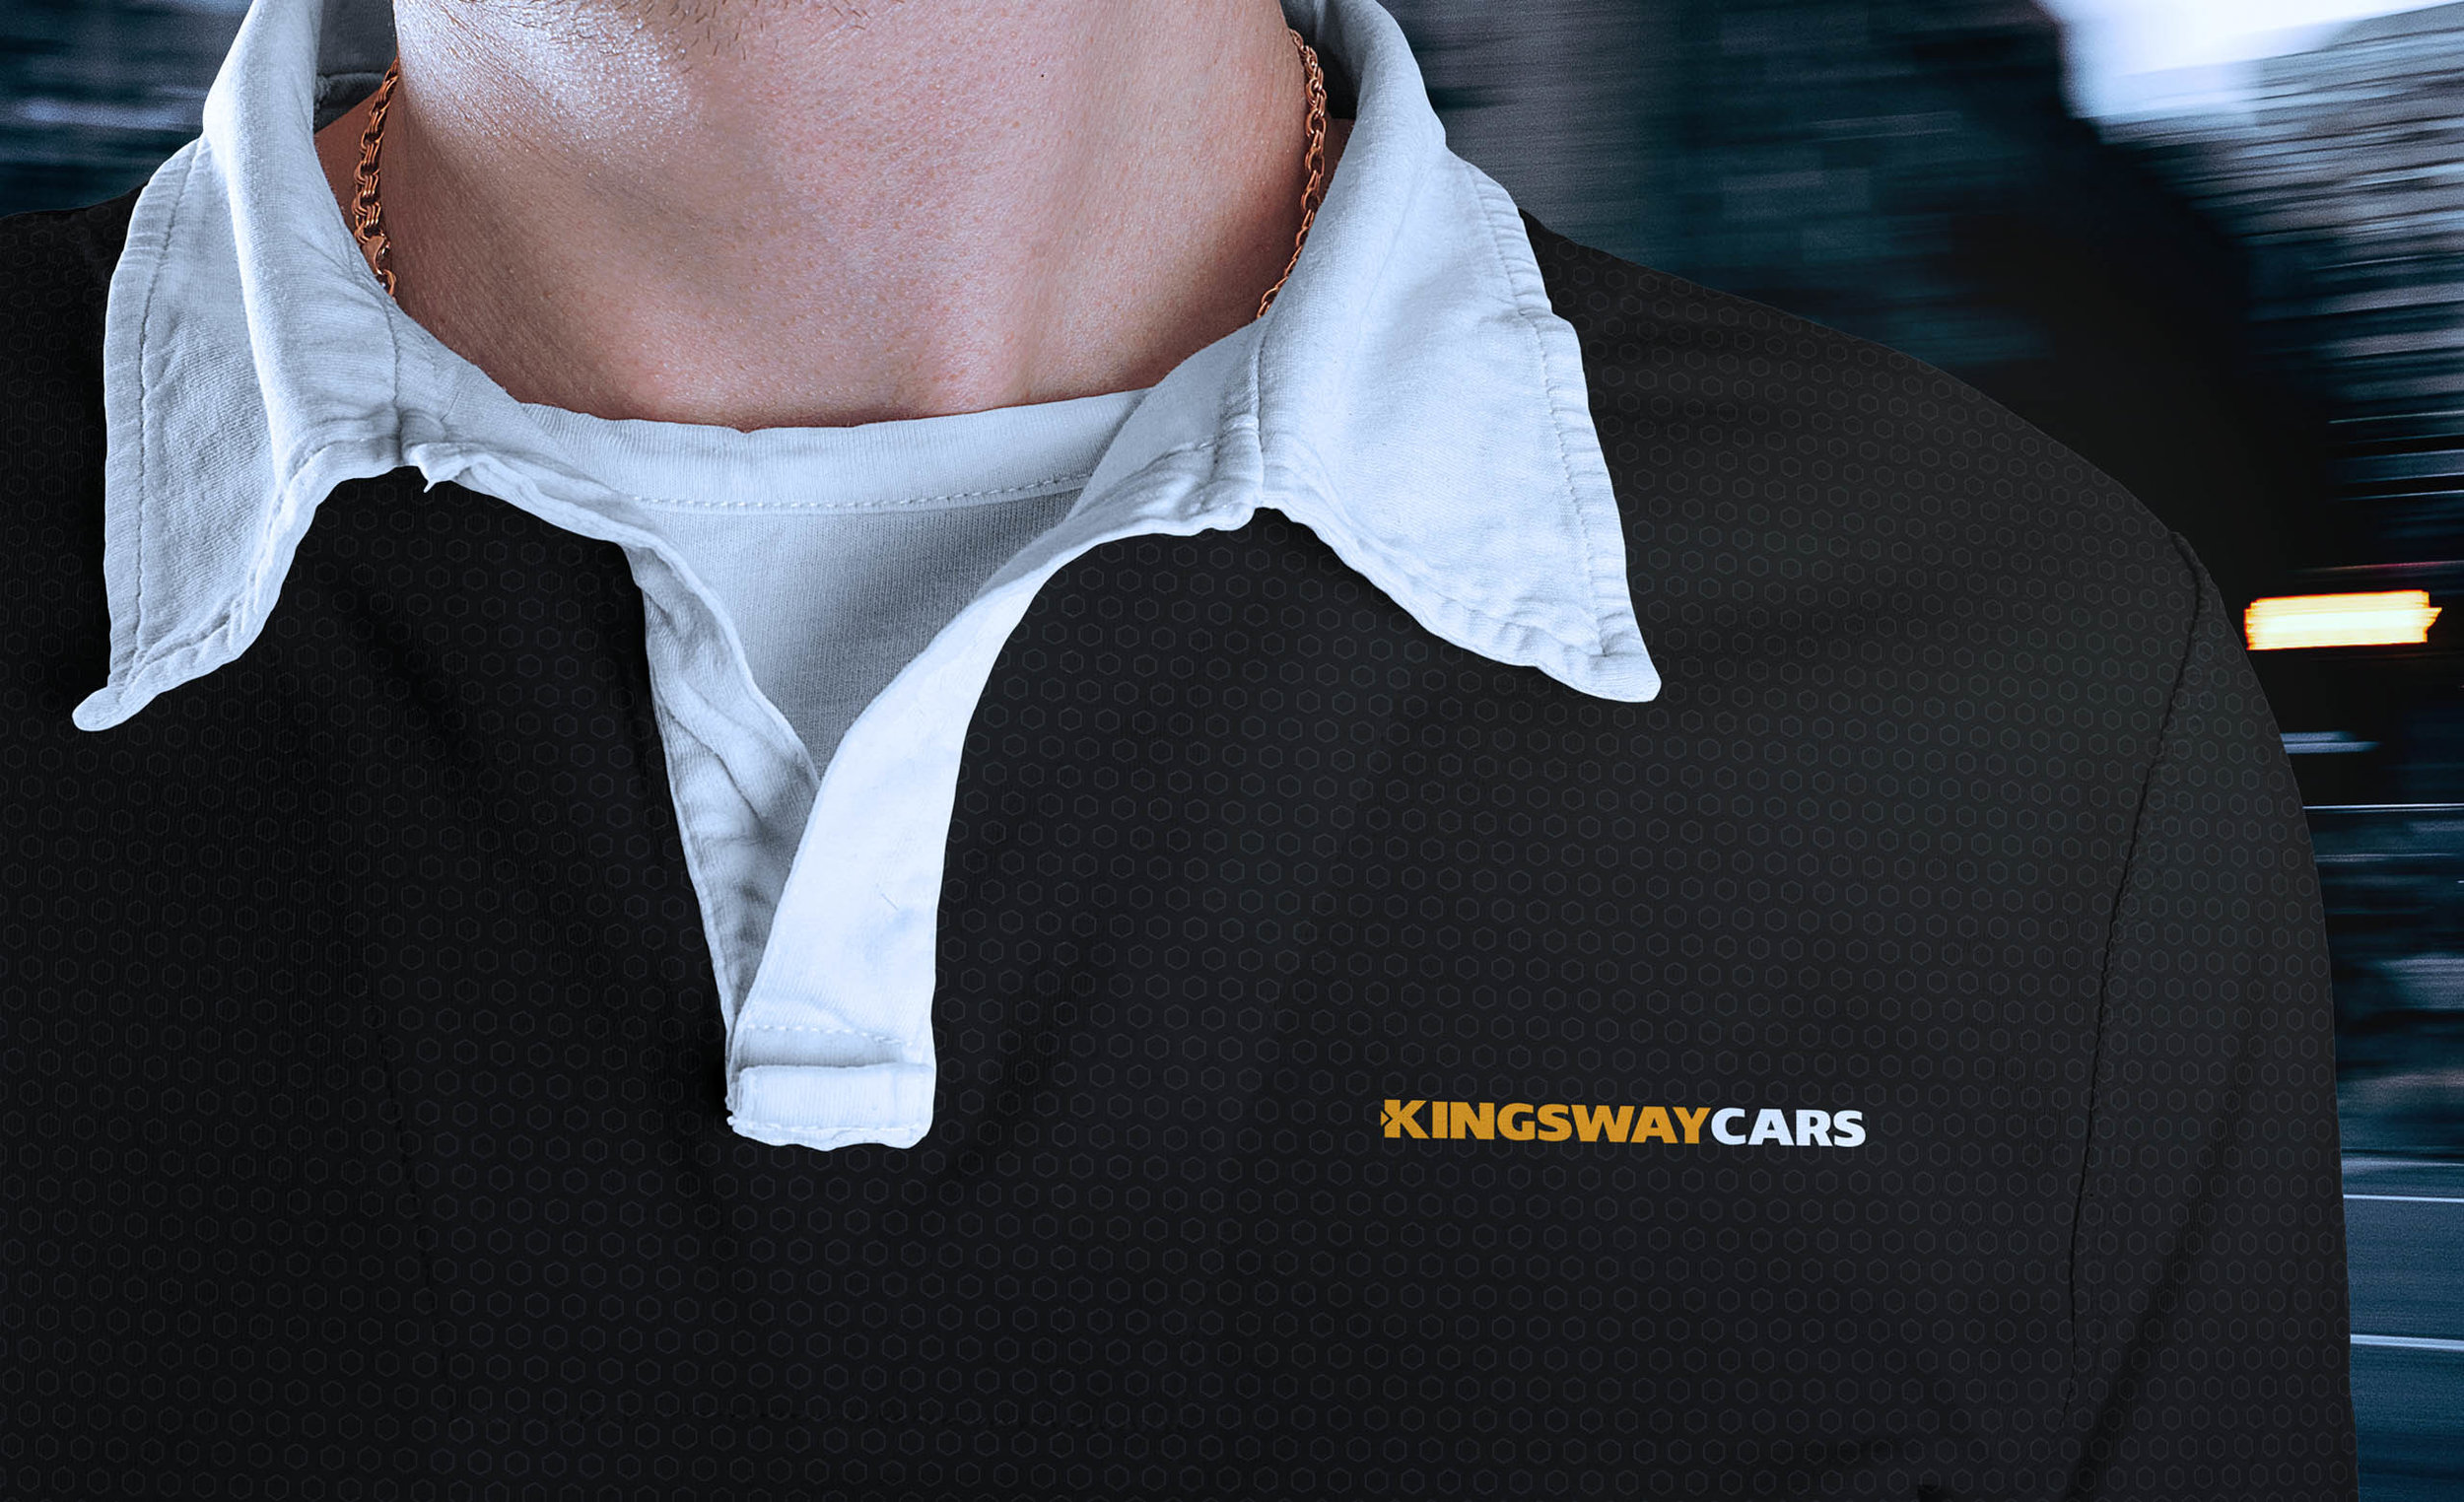 kingsway-cars-polo-mockup.jpg